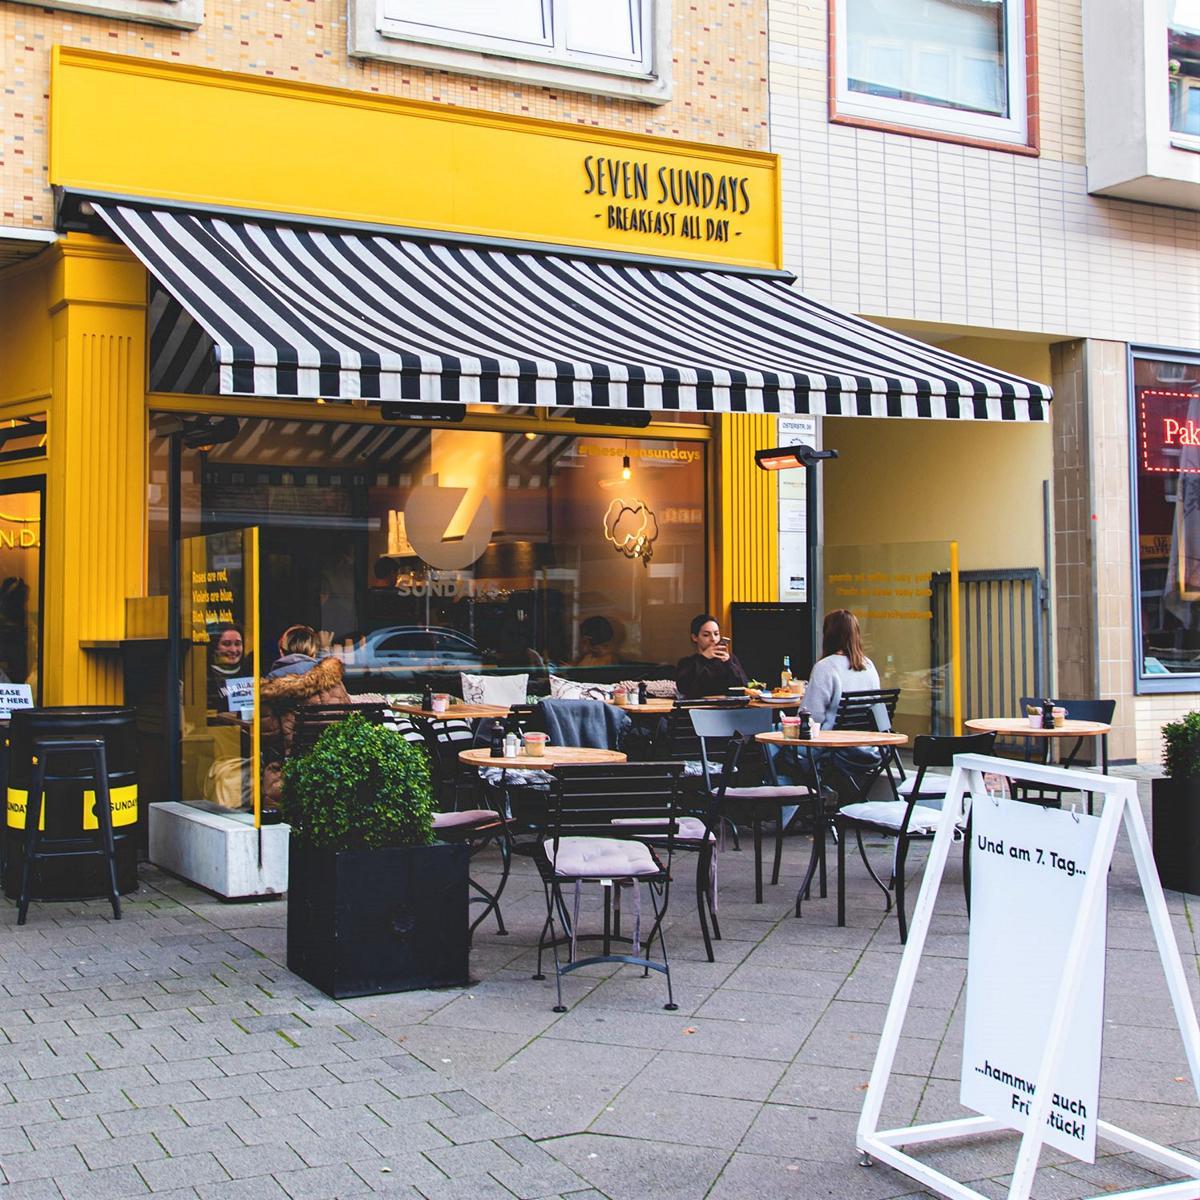 Style Hannover The Seven Sundays 2 - The Seven Sundays - jeden Tag bis abends frühstücken